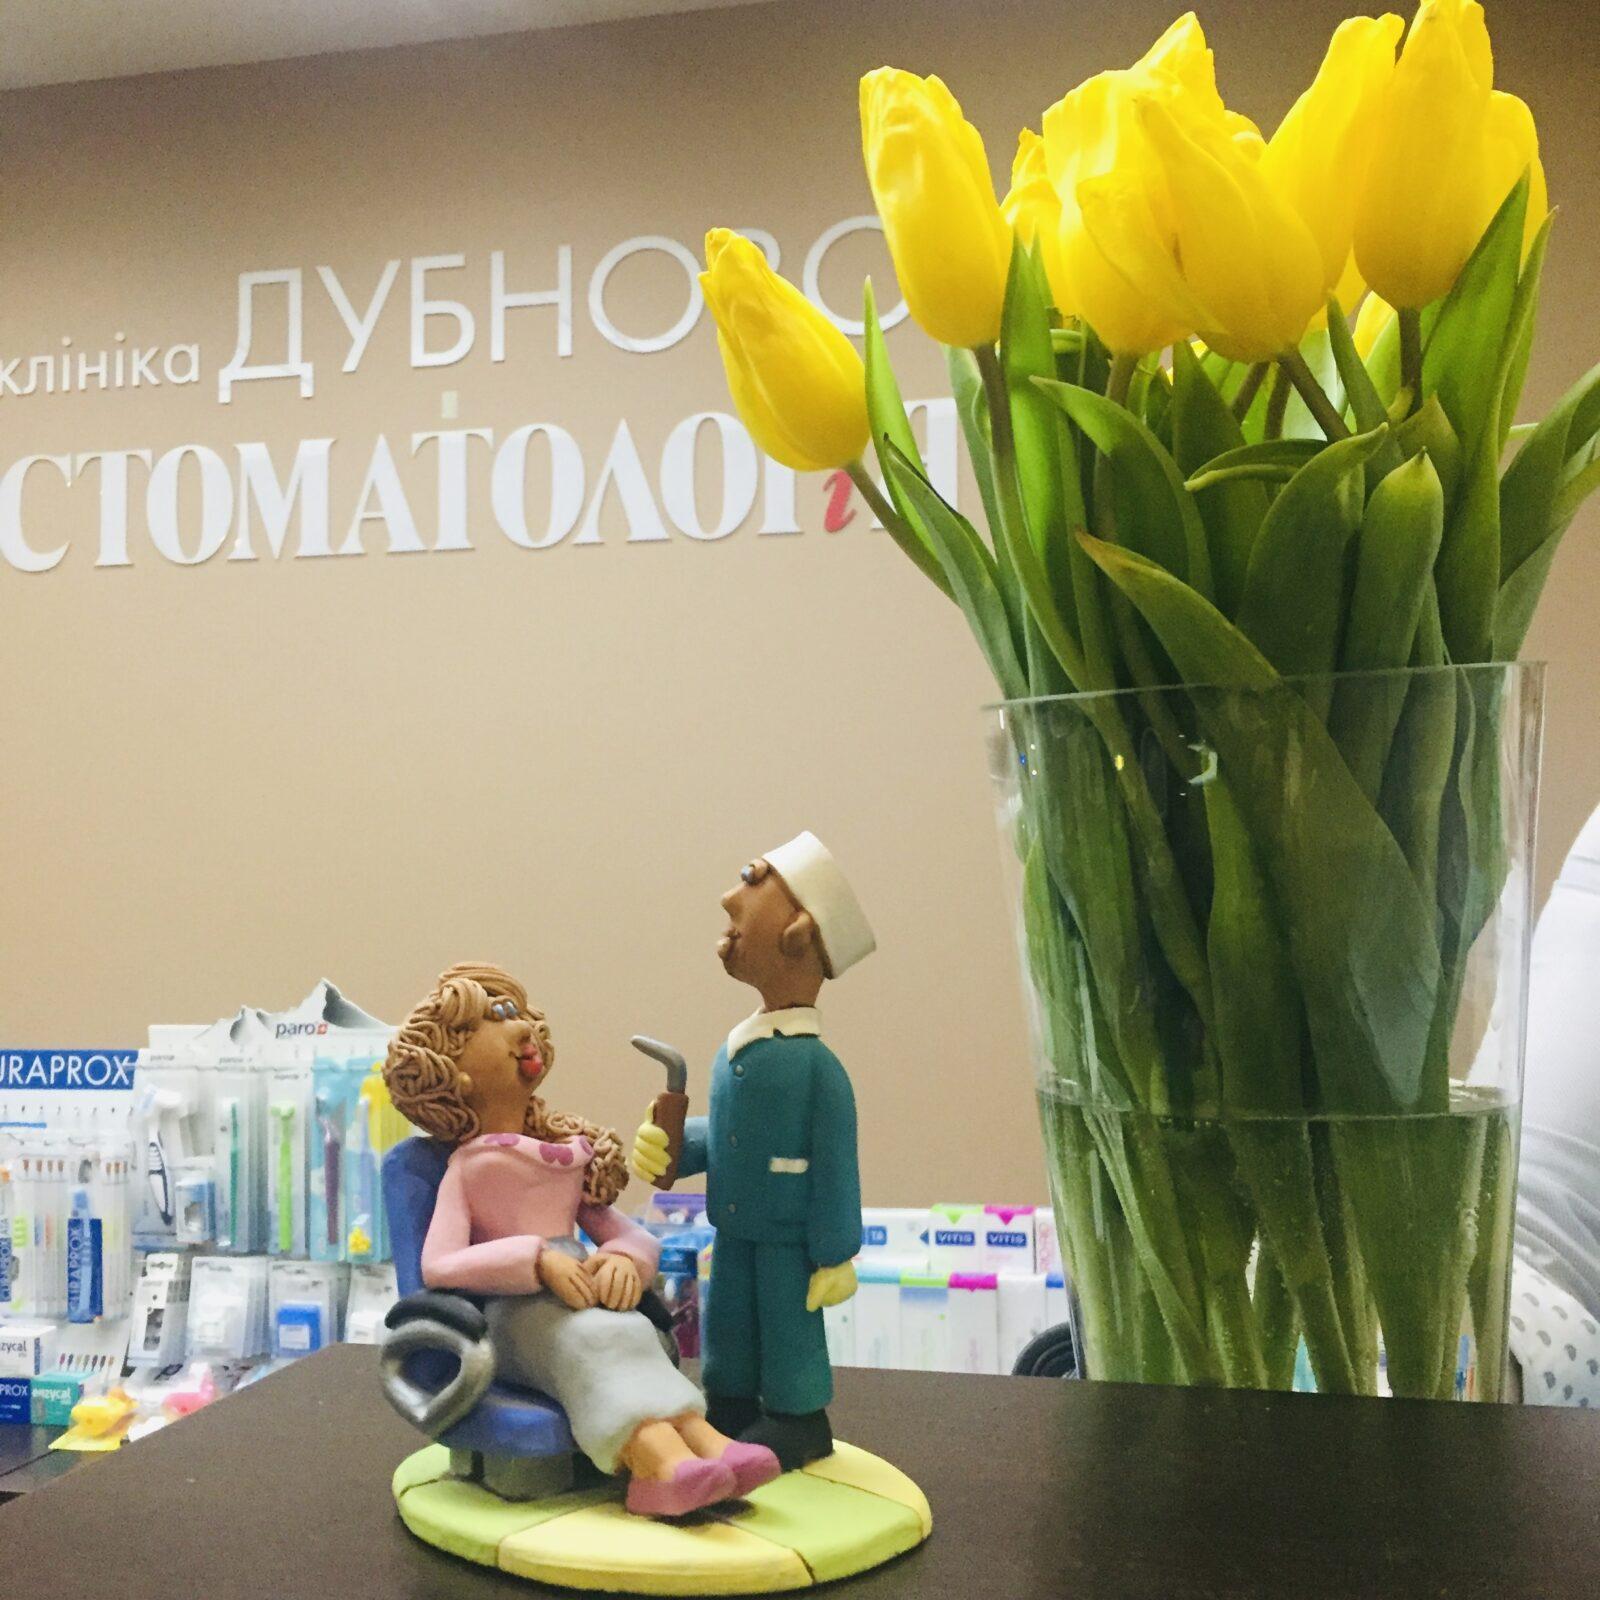 img 2397 - Днем медицинского работника!